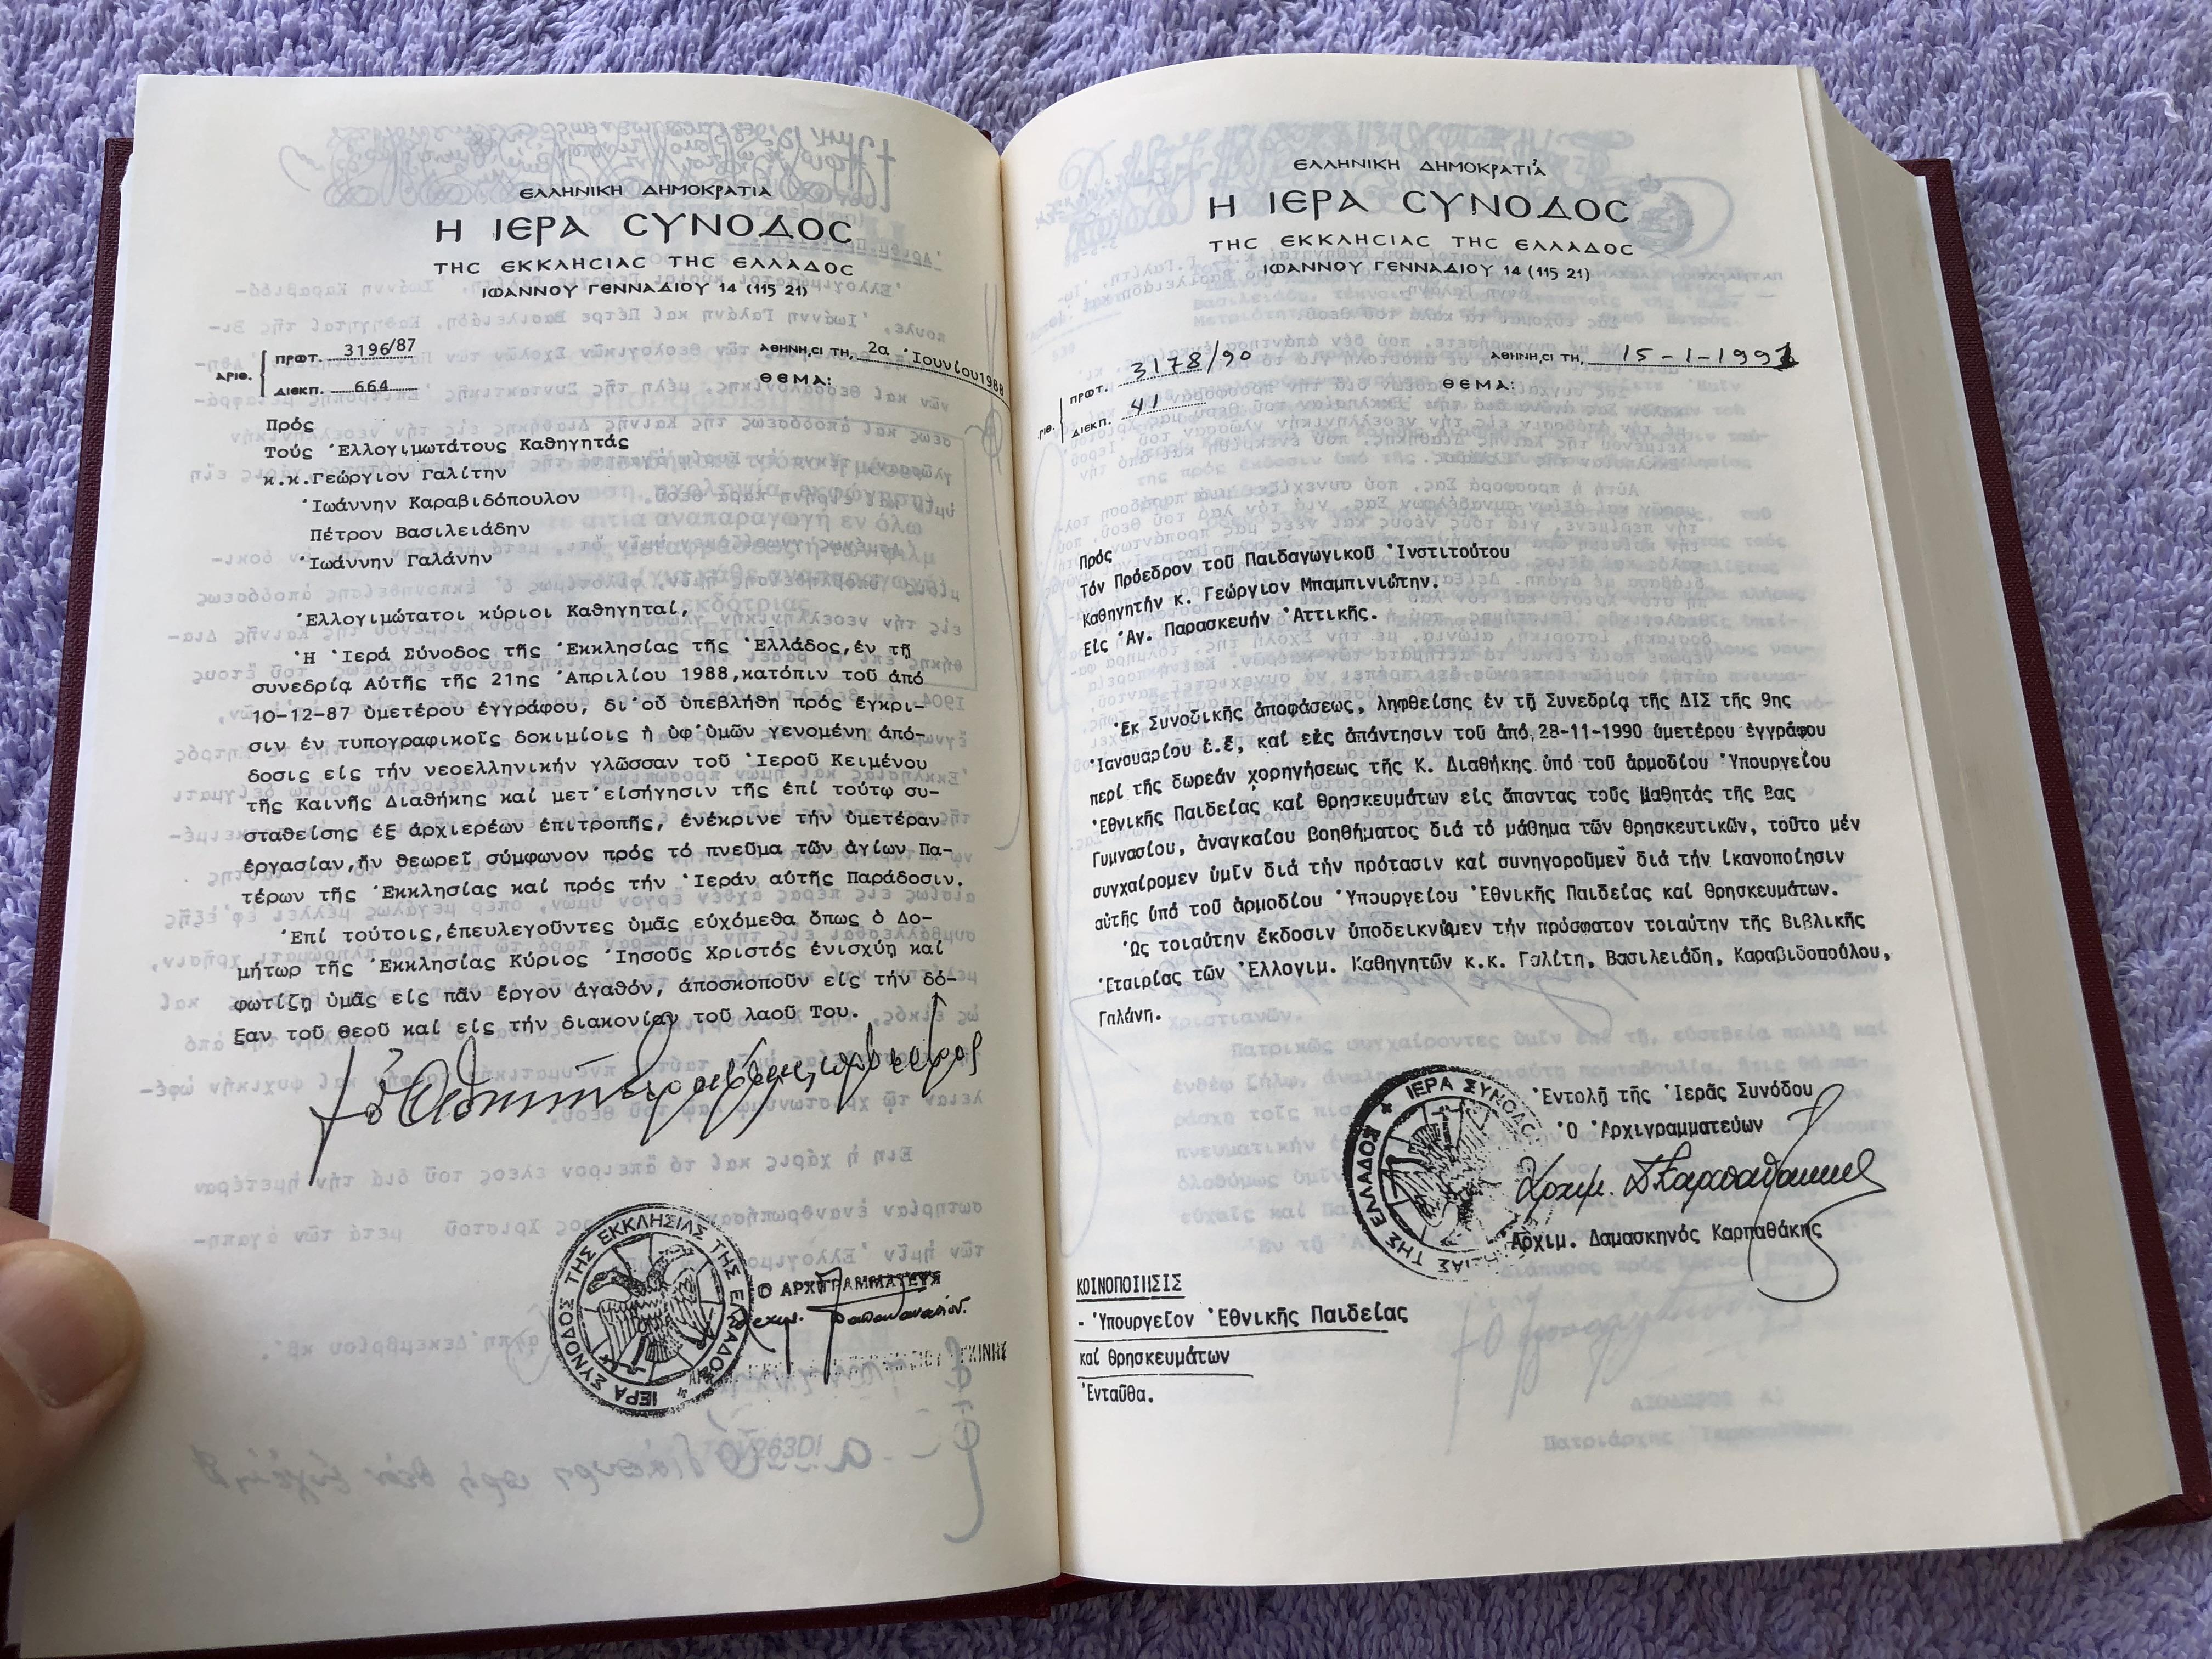 img-1806.jpg